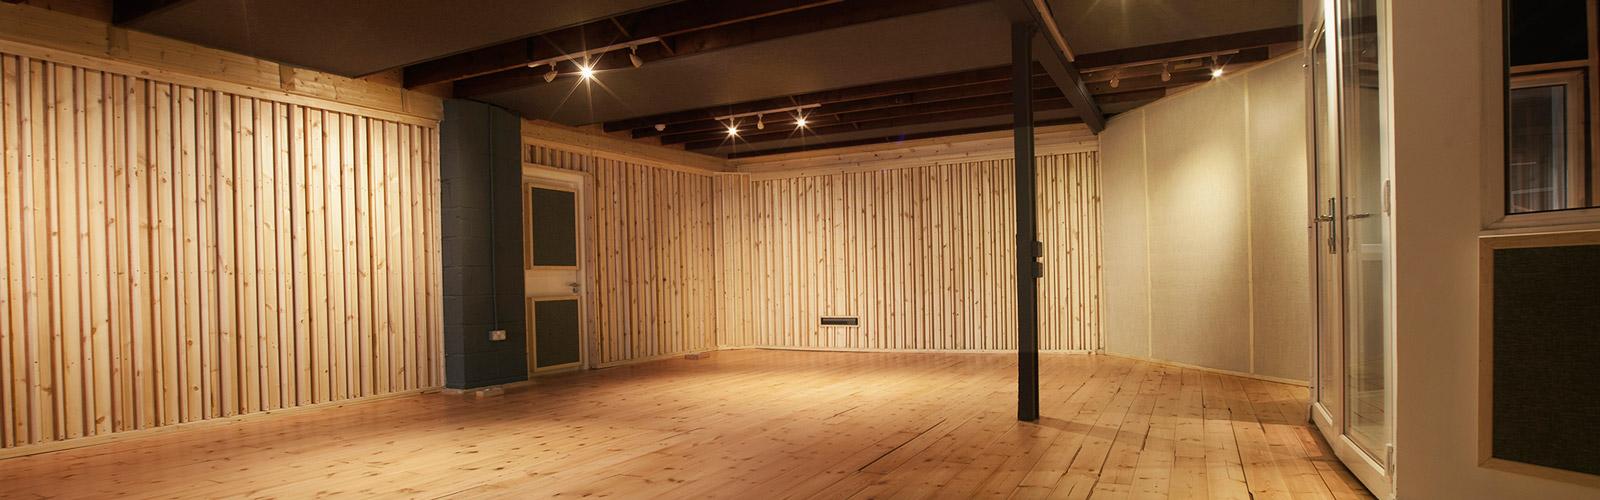 Loft Music Studios - Live Room 2